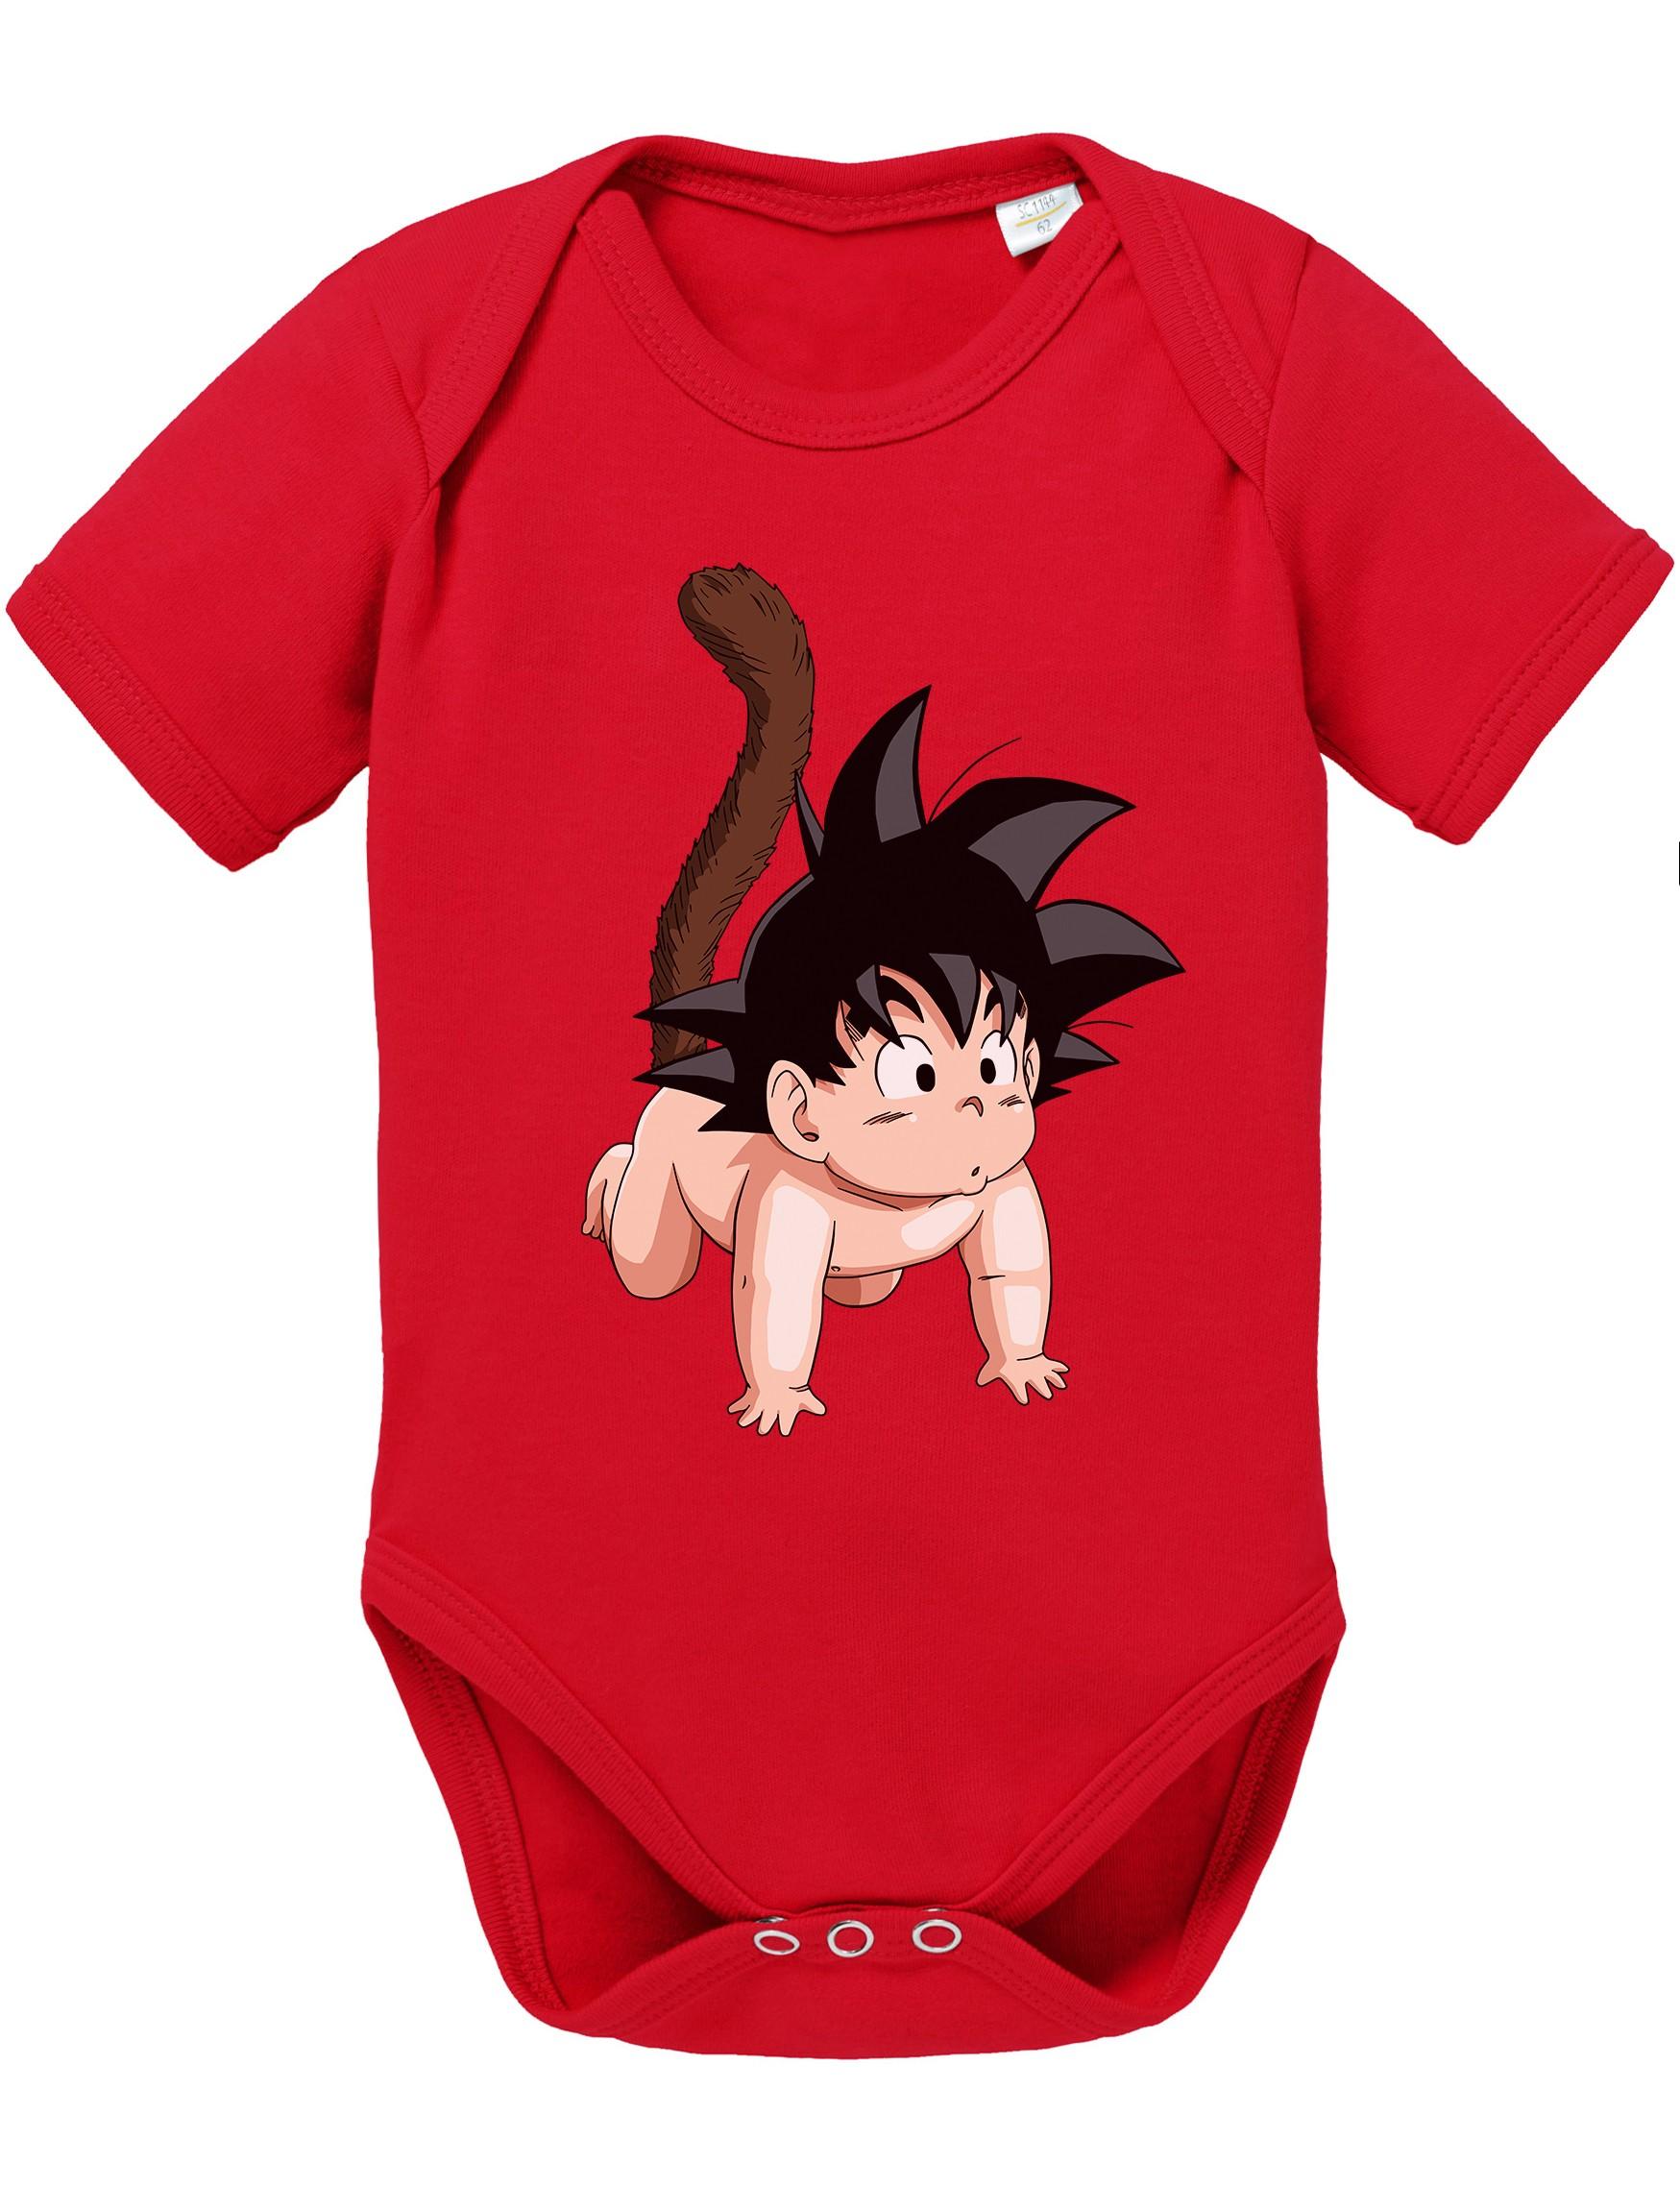 Premium-Auswahl 91ba0 12431 Son Goku baby Baby Strampler Body